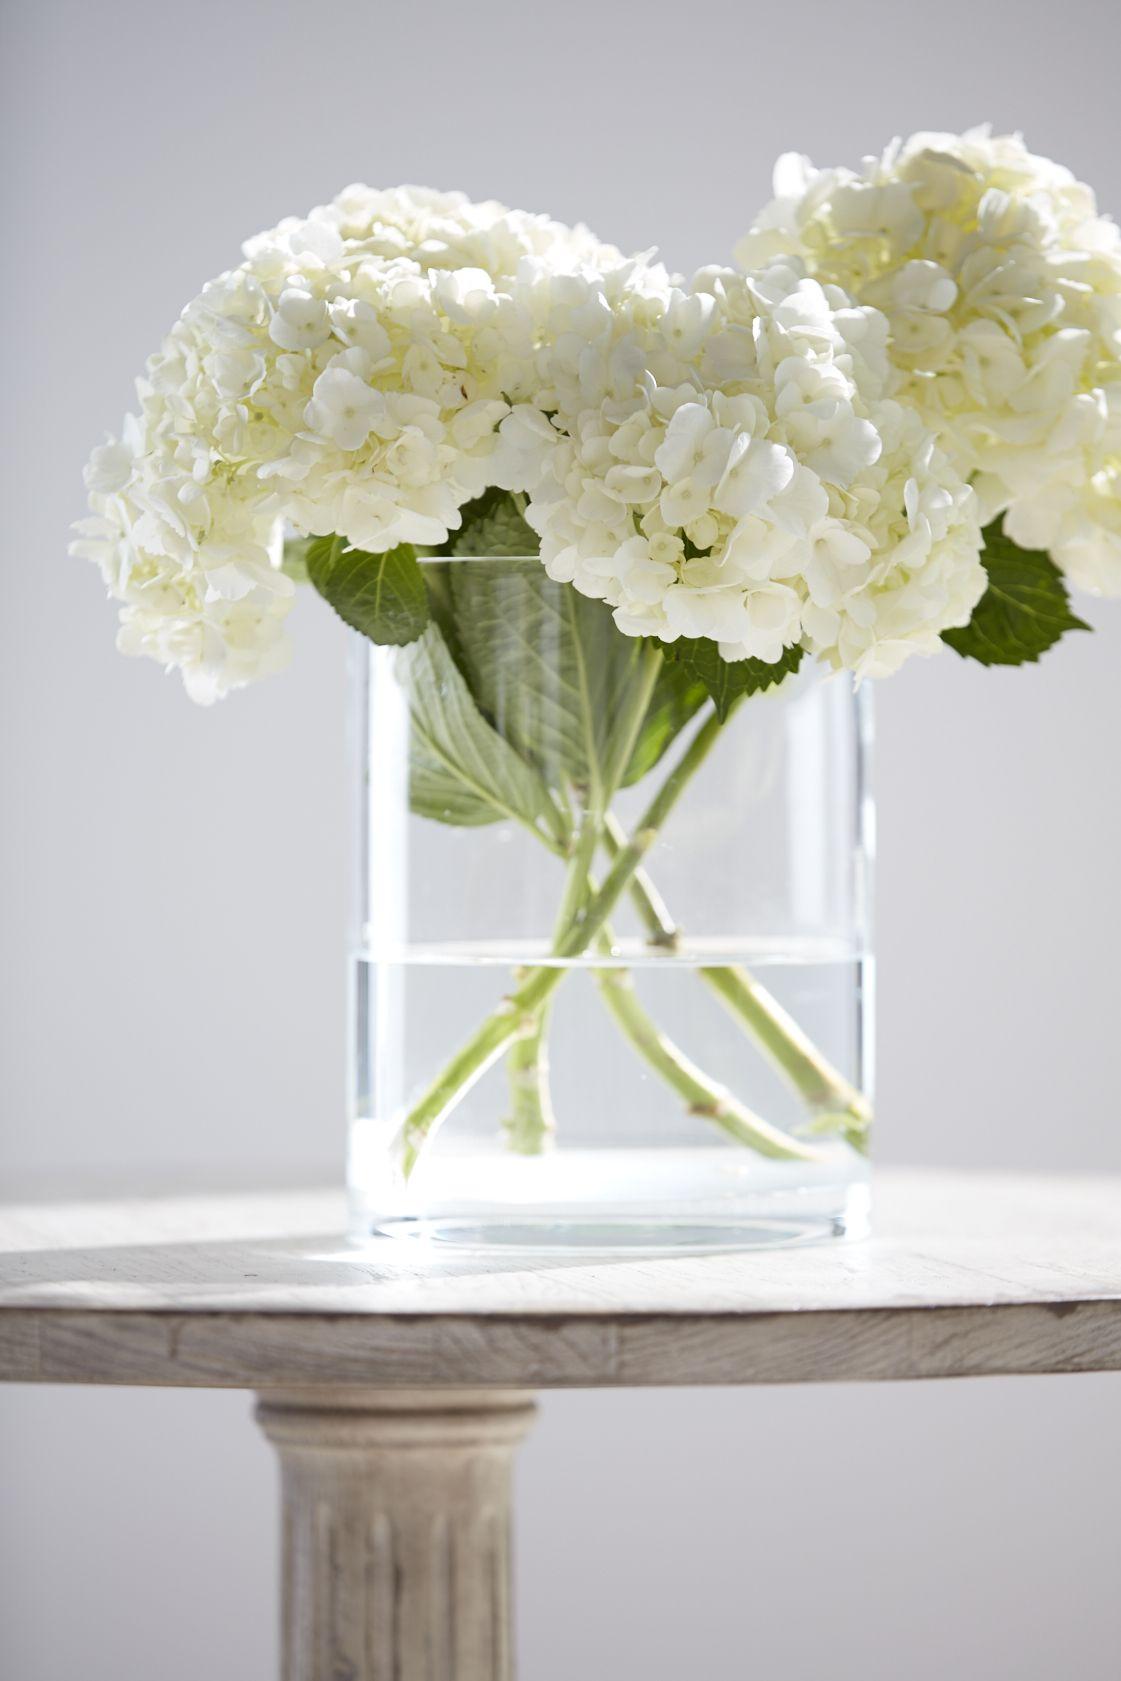 Pin By Kathy Schickle On Flowers Pinterest Hydrangea Flowers